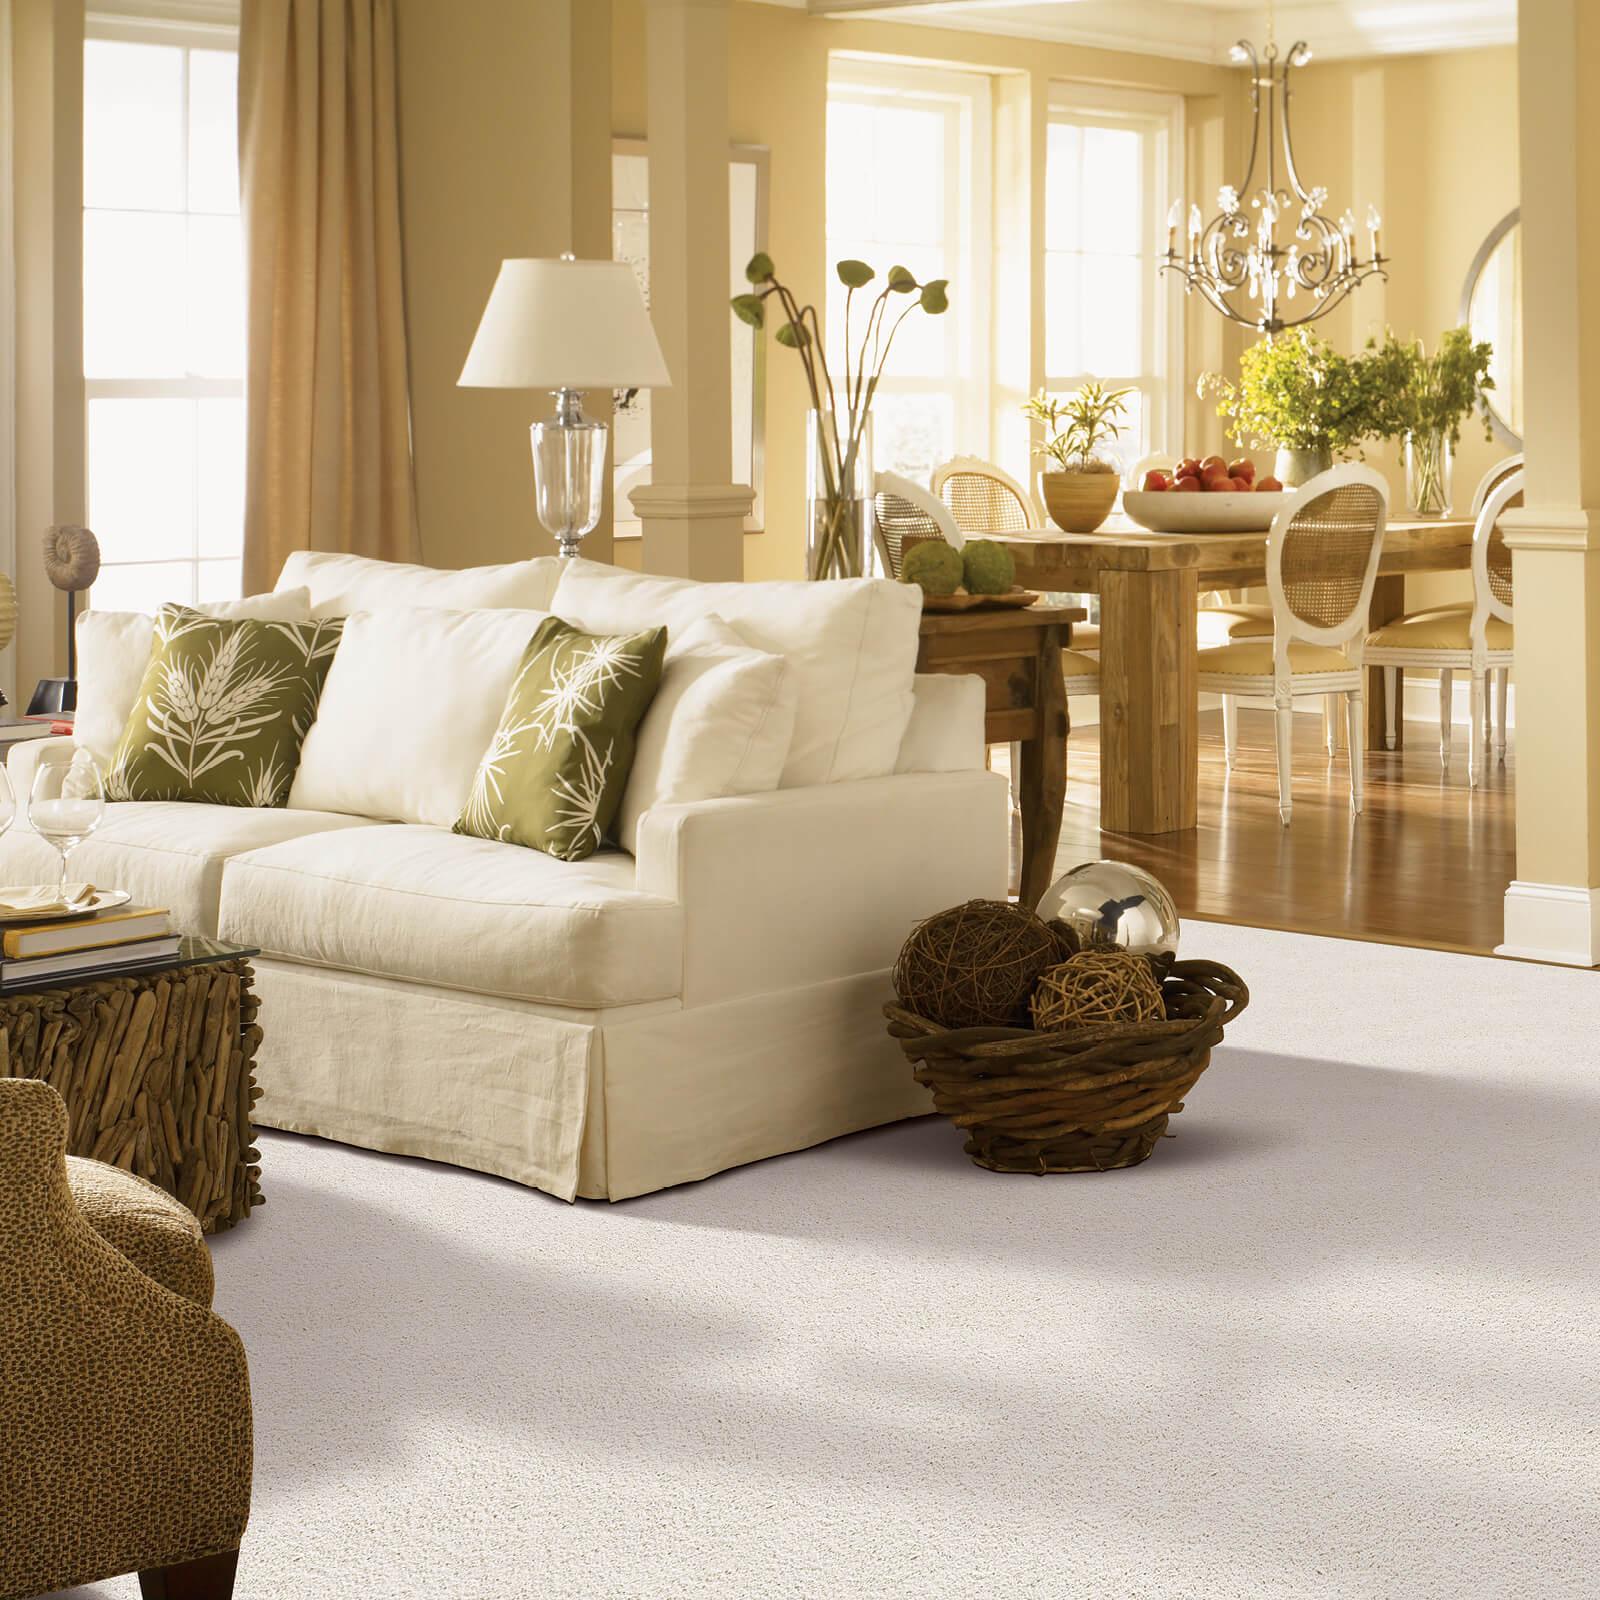 Living room interior | McSwain Carpet & Floors